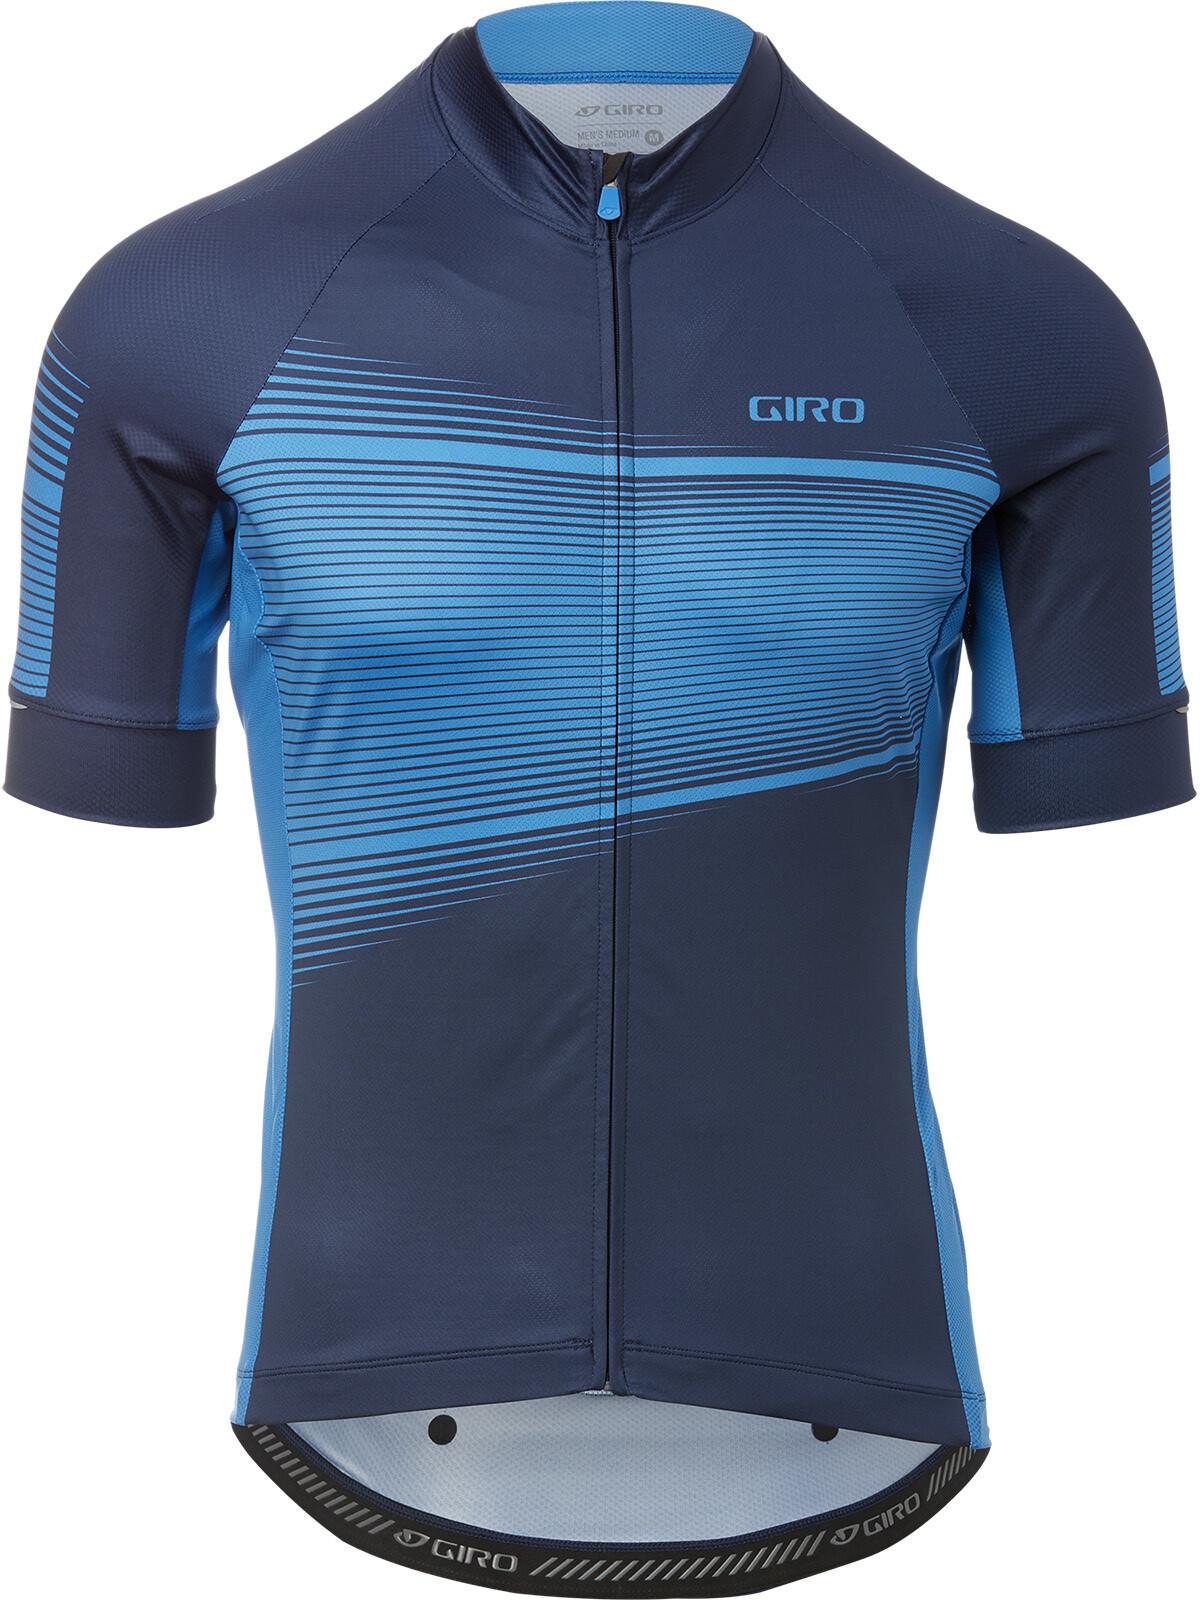 Giro Chrono Expert Kortærmet cykeltrøje Herrer, midnight/blue heatwave (2019) | Jerseys